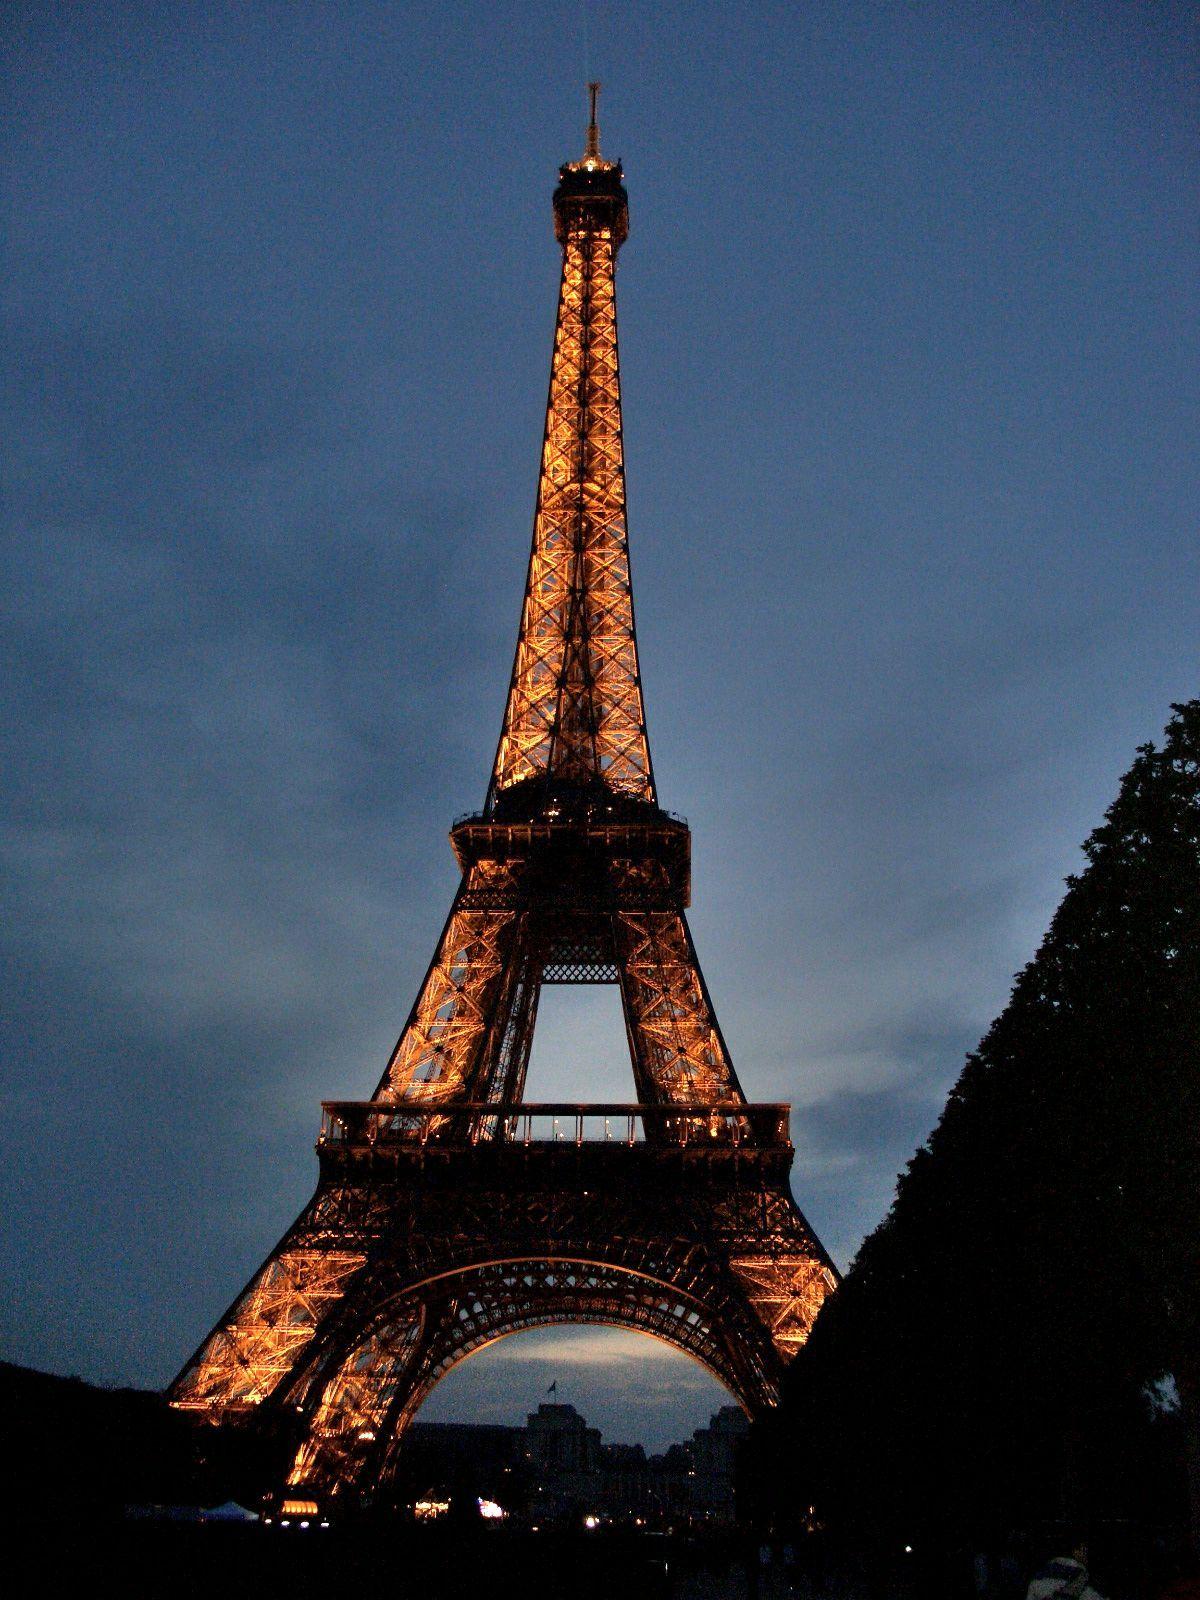 Эйфелева башня | Эйфелева башня, Фотография парижа, Париж